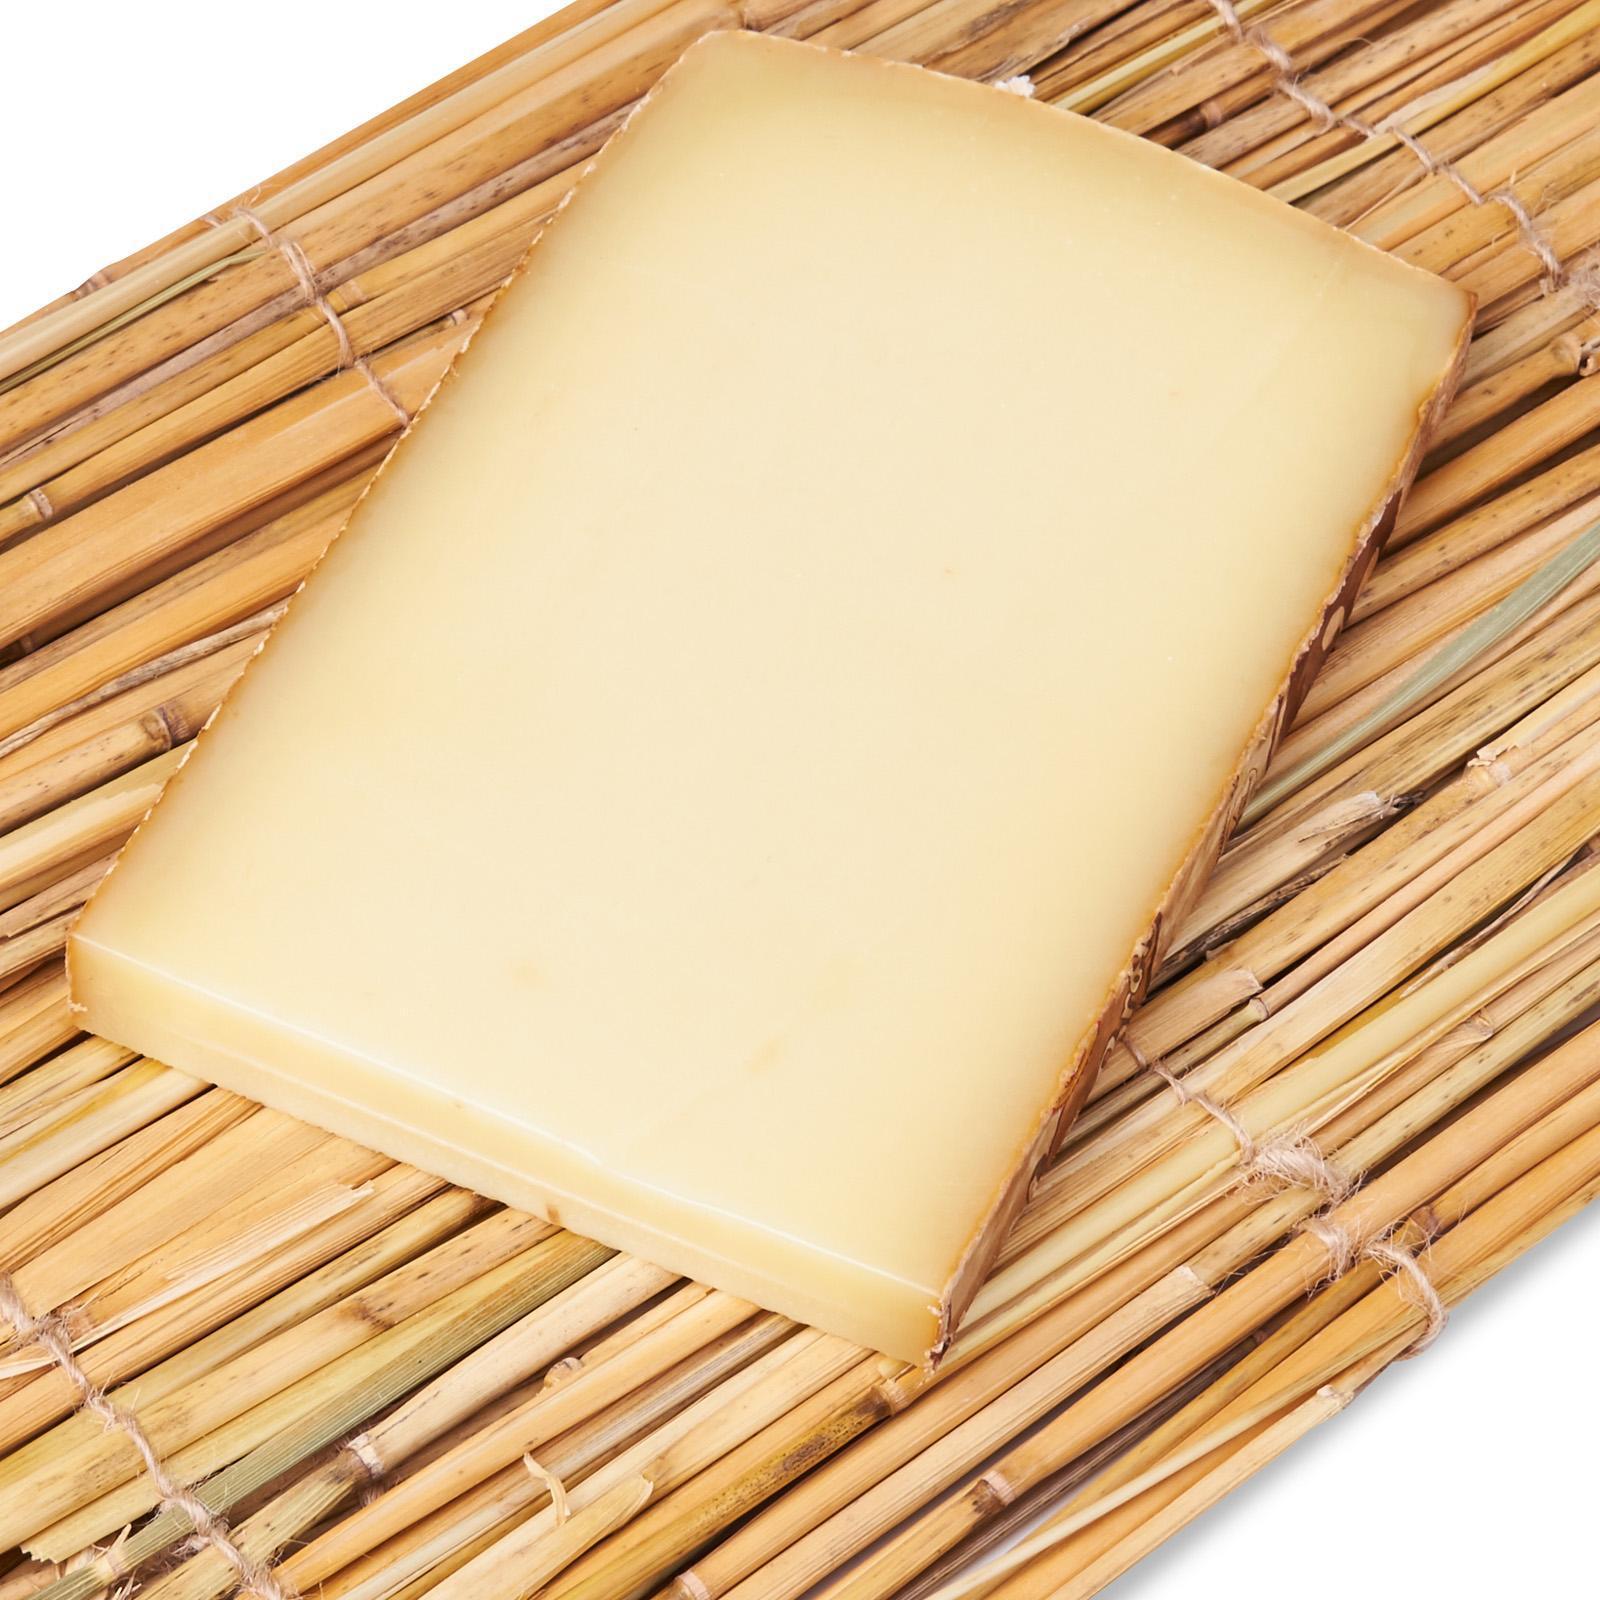 La Petite Boutique Comte 4/7 Months Fromagerie Rieme Cheese By Redmart.